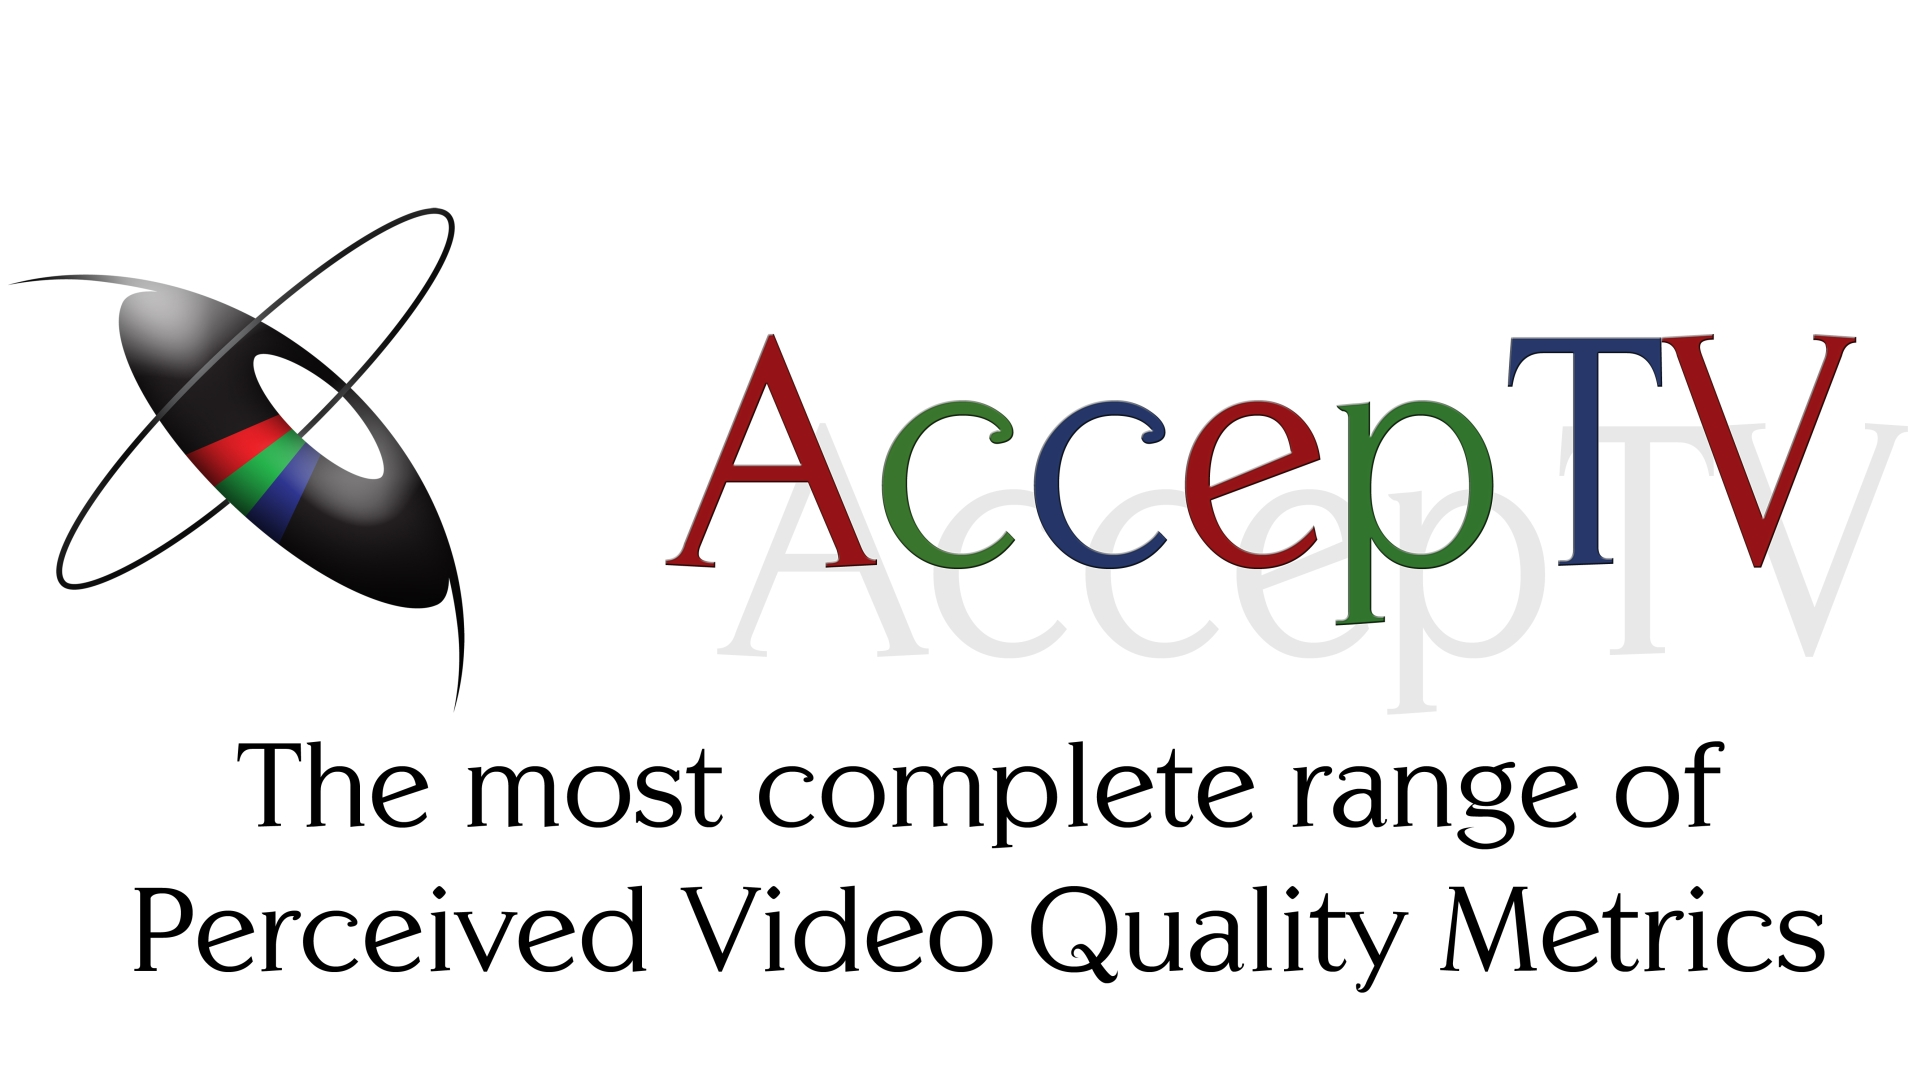 AccepTV